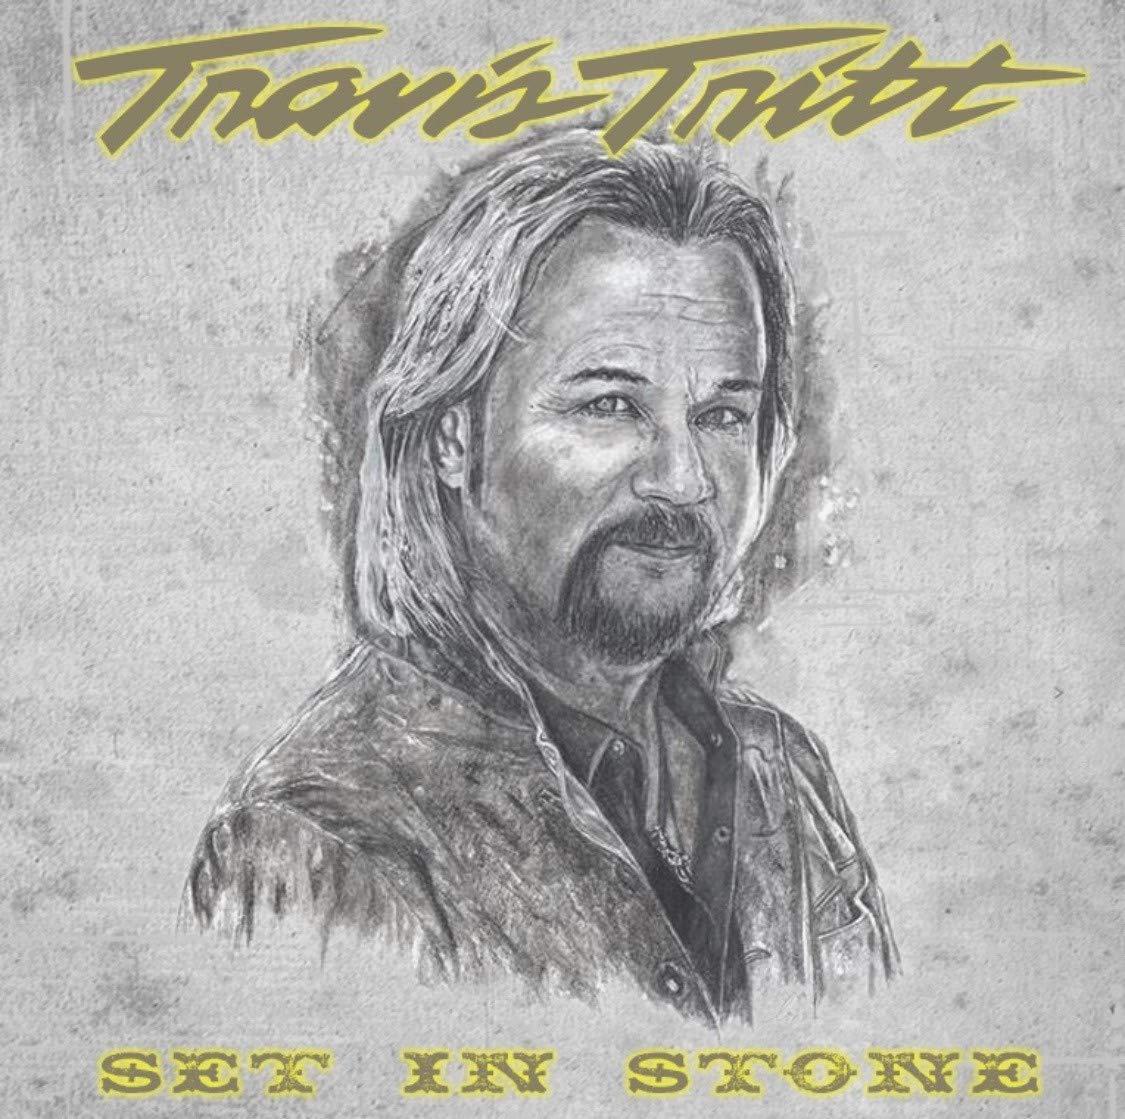 Travis Tritt – Set In Stone (2021) [FLAC]